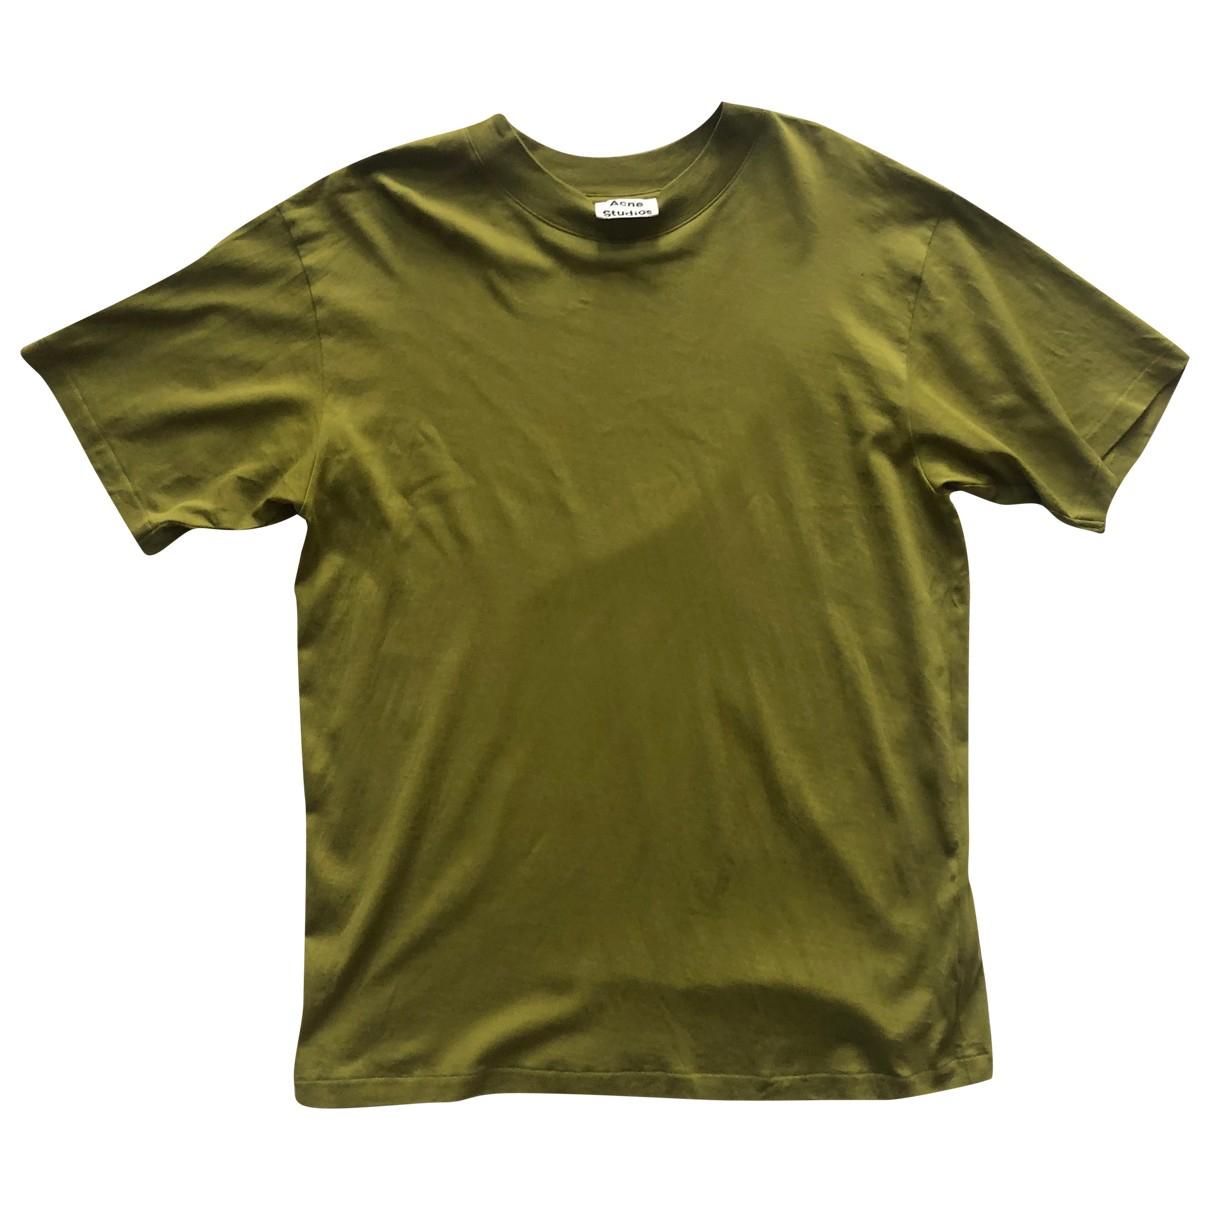 Acne Studios \N Green Cotton T-shirts for Men L International